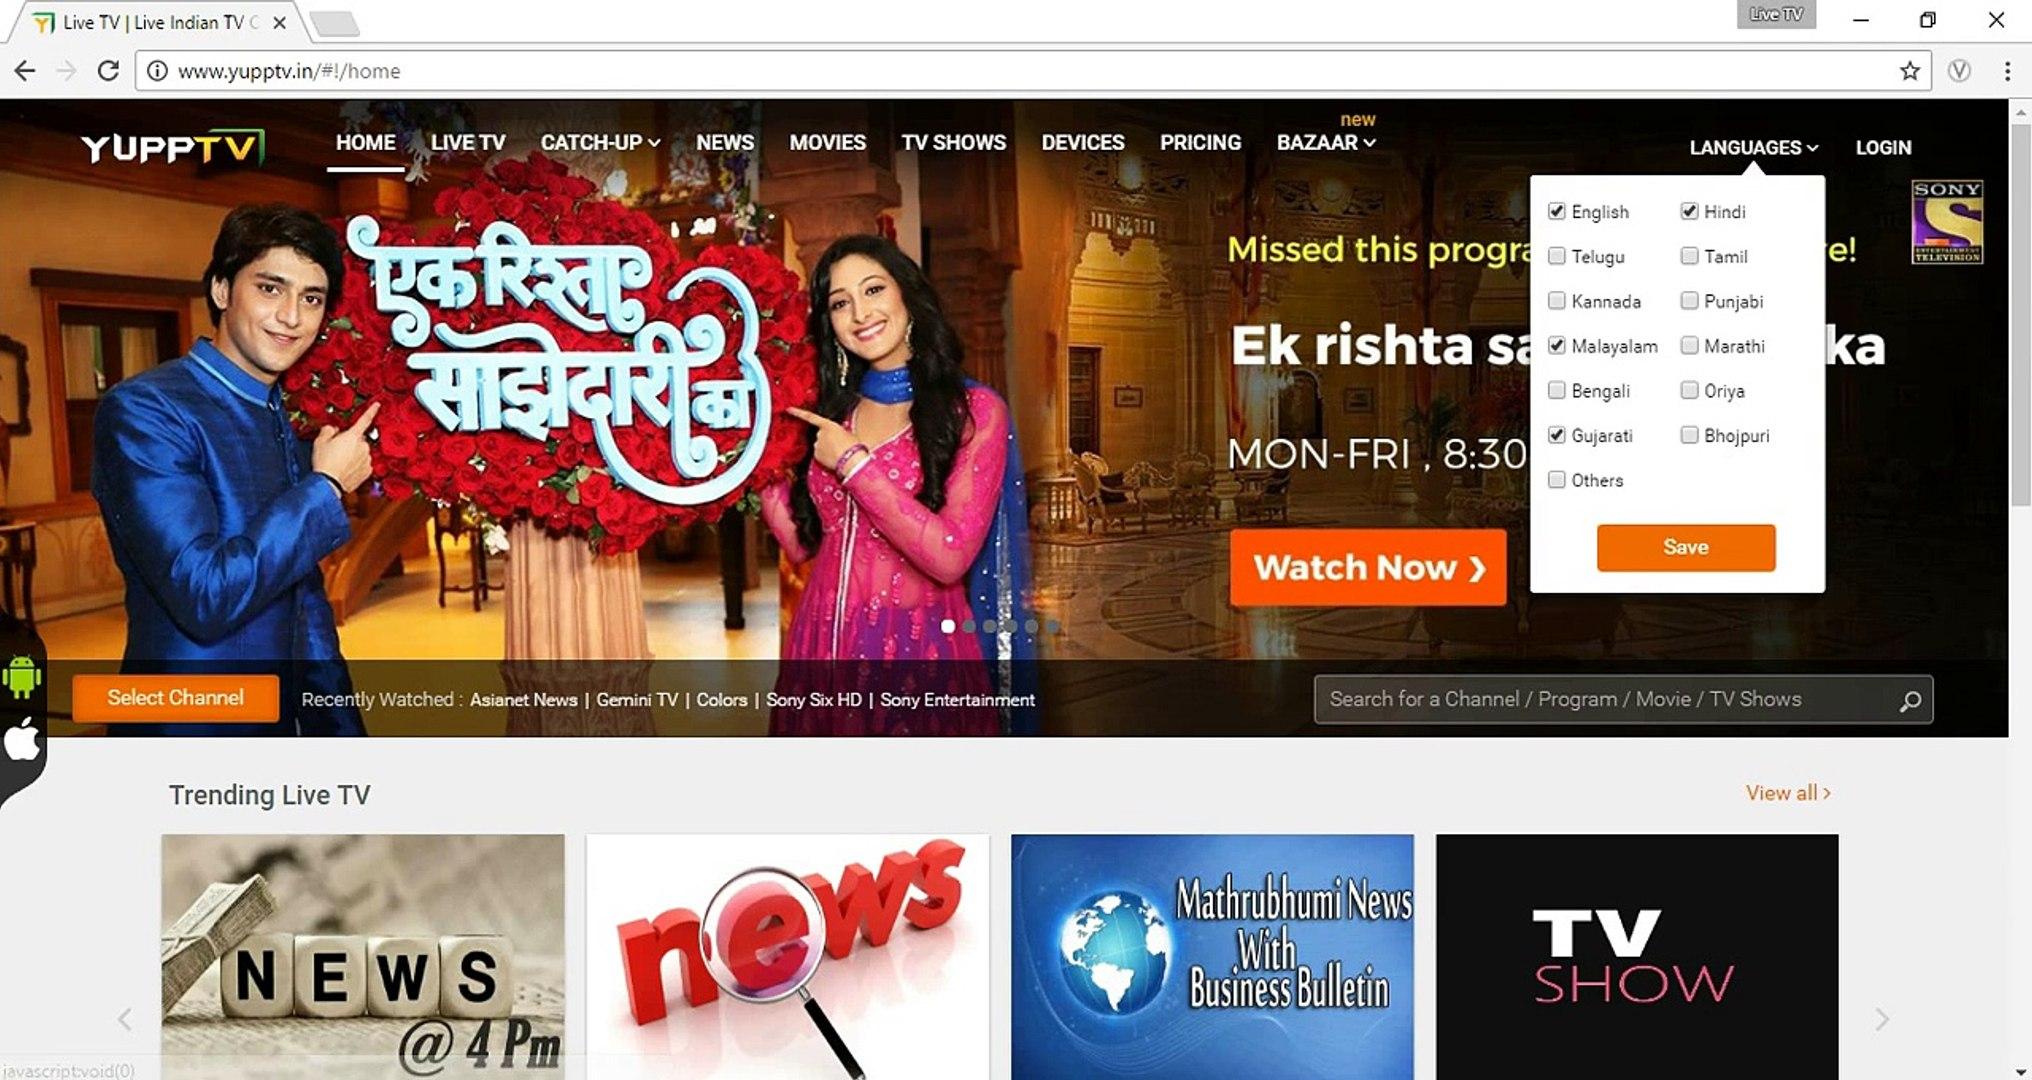 Asianet News Live - Malayalam News Channels Live